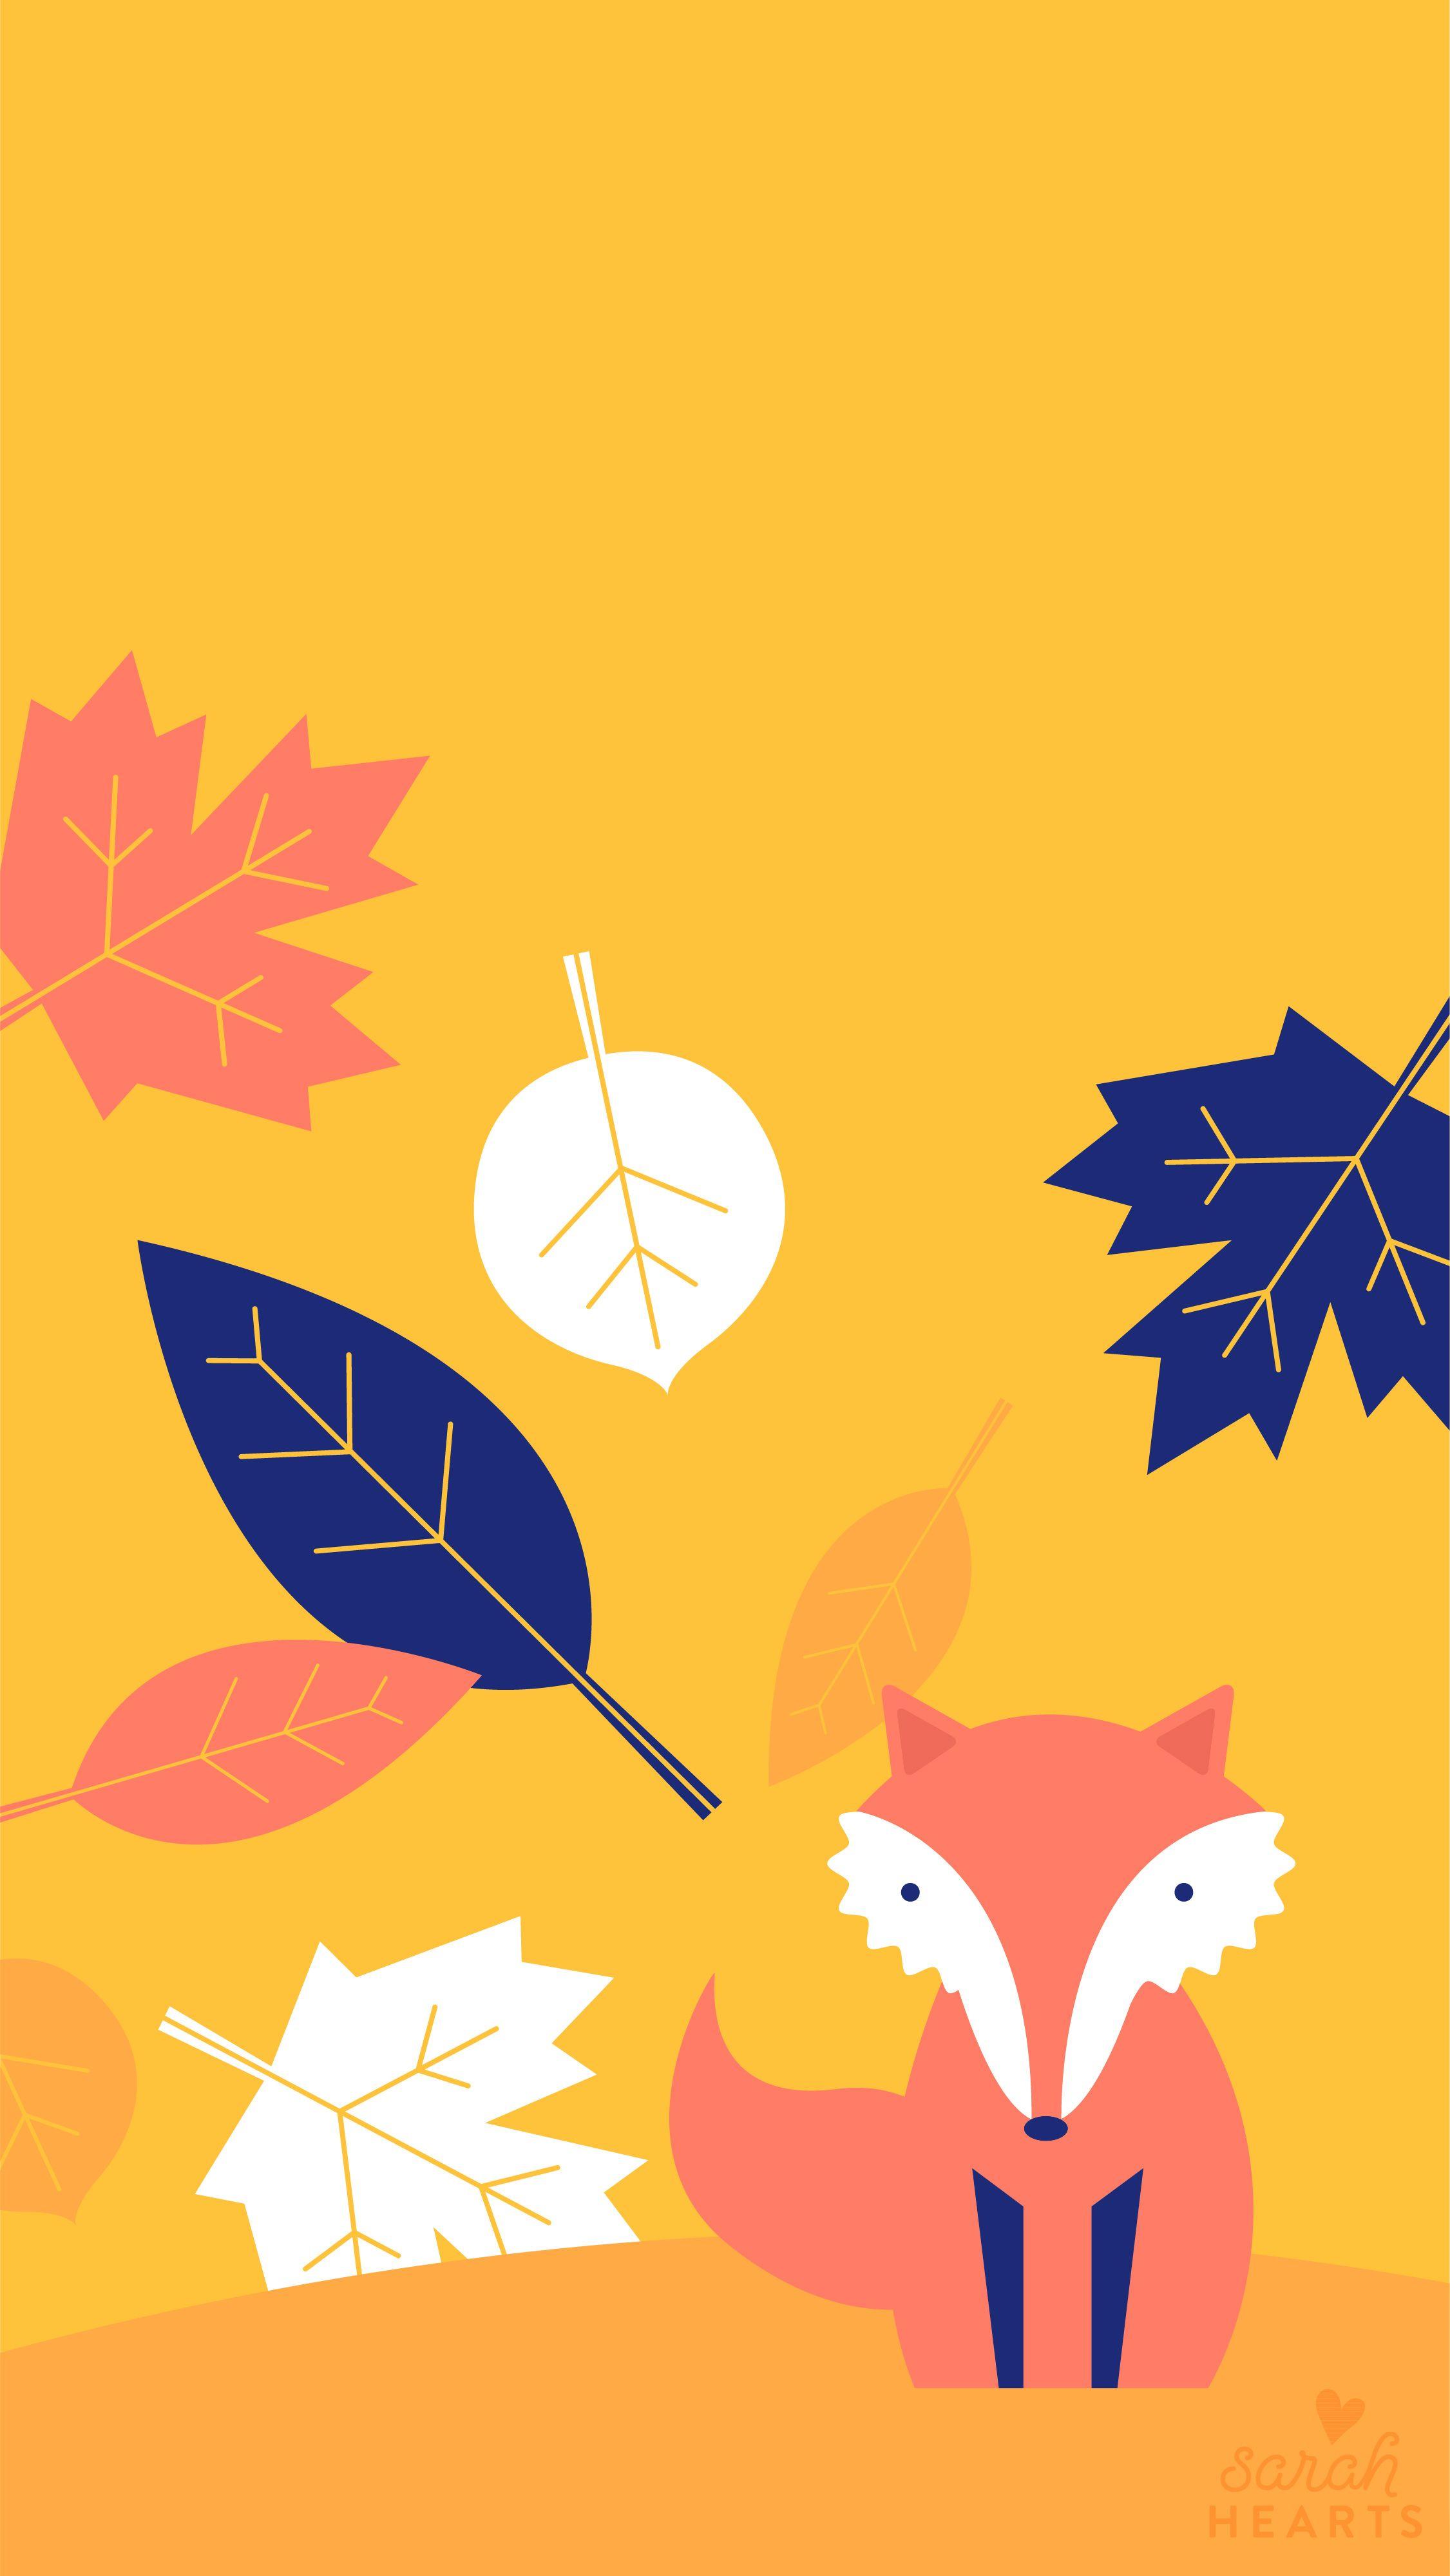 Fall Leaf and Fox October 2017 Calendar Wallpaper